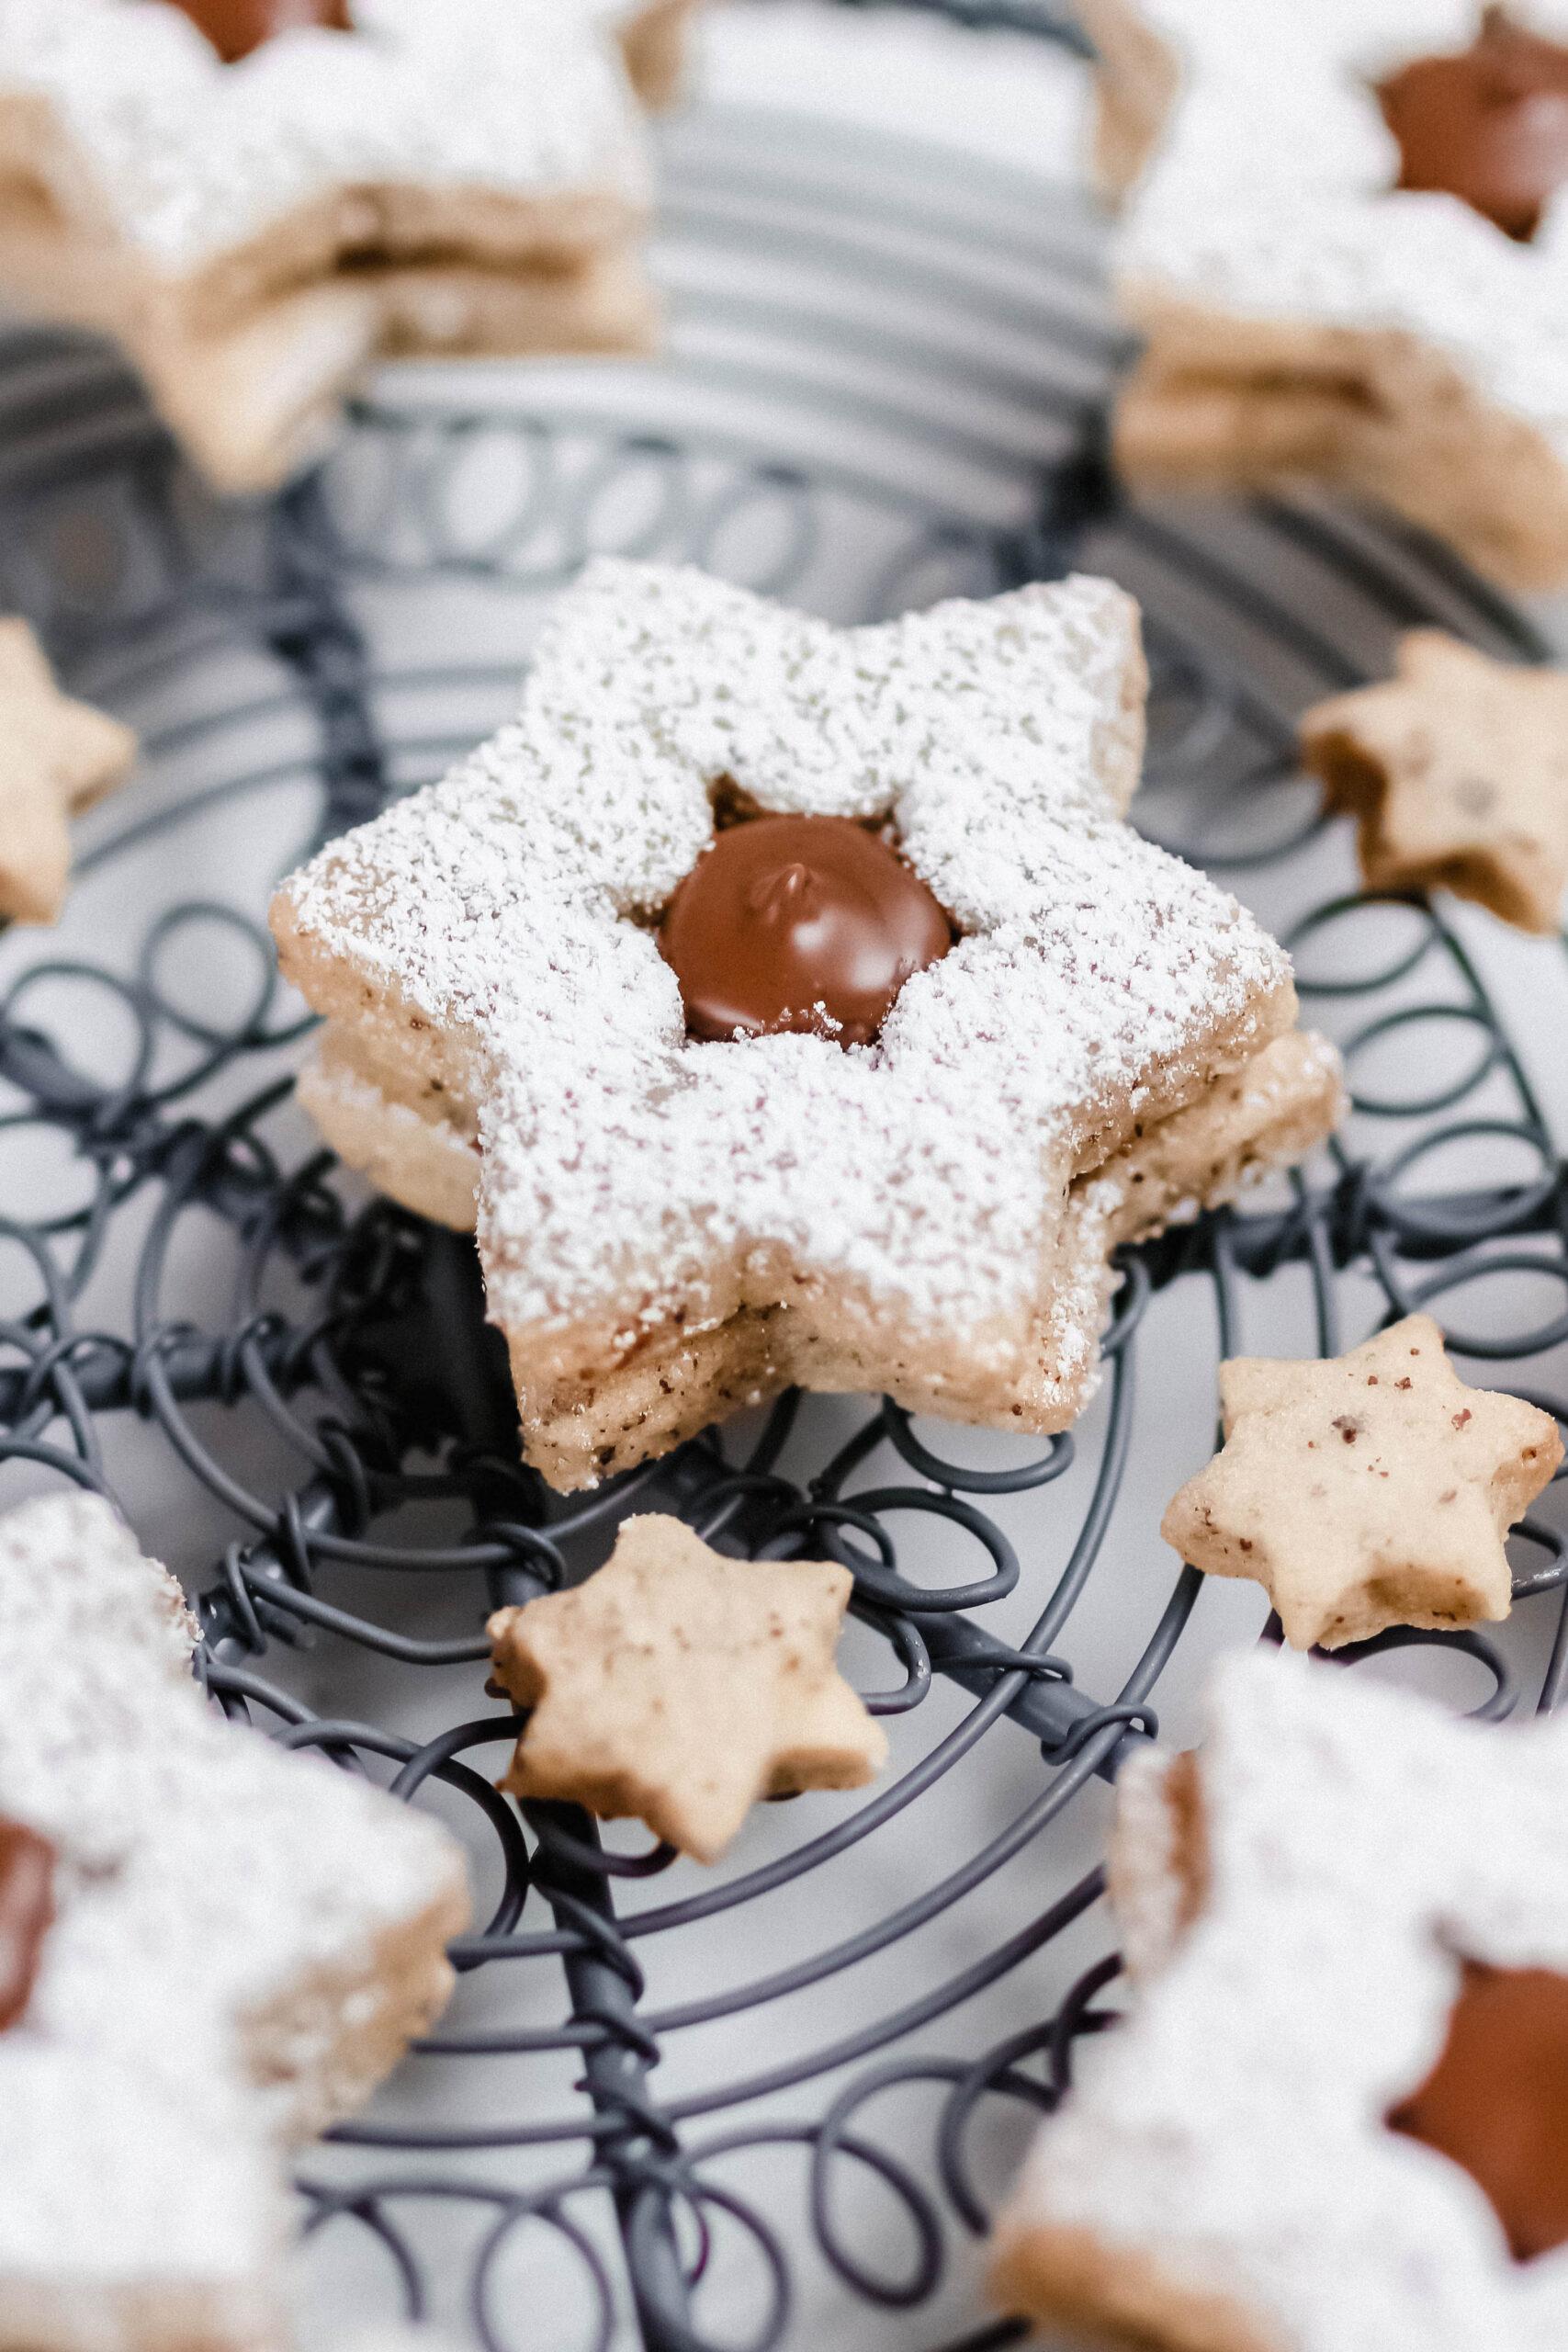 Weihnachtsbäckerei: Nuss Nougat Sterne